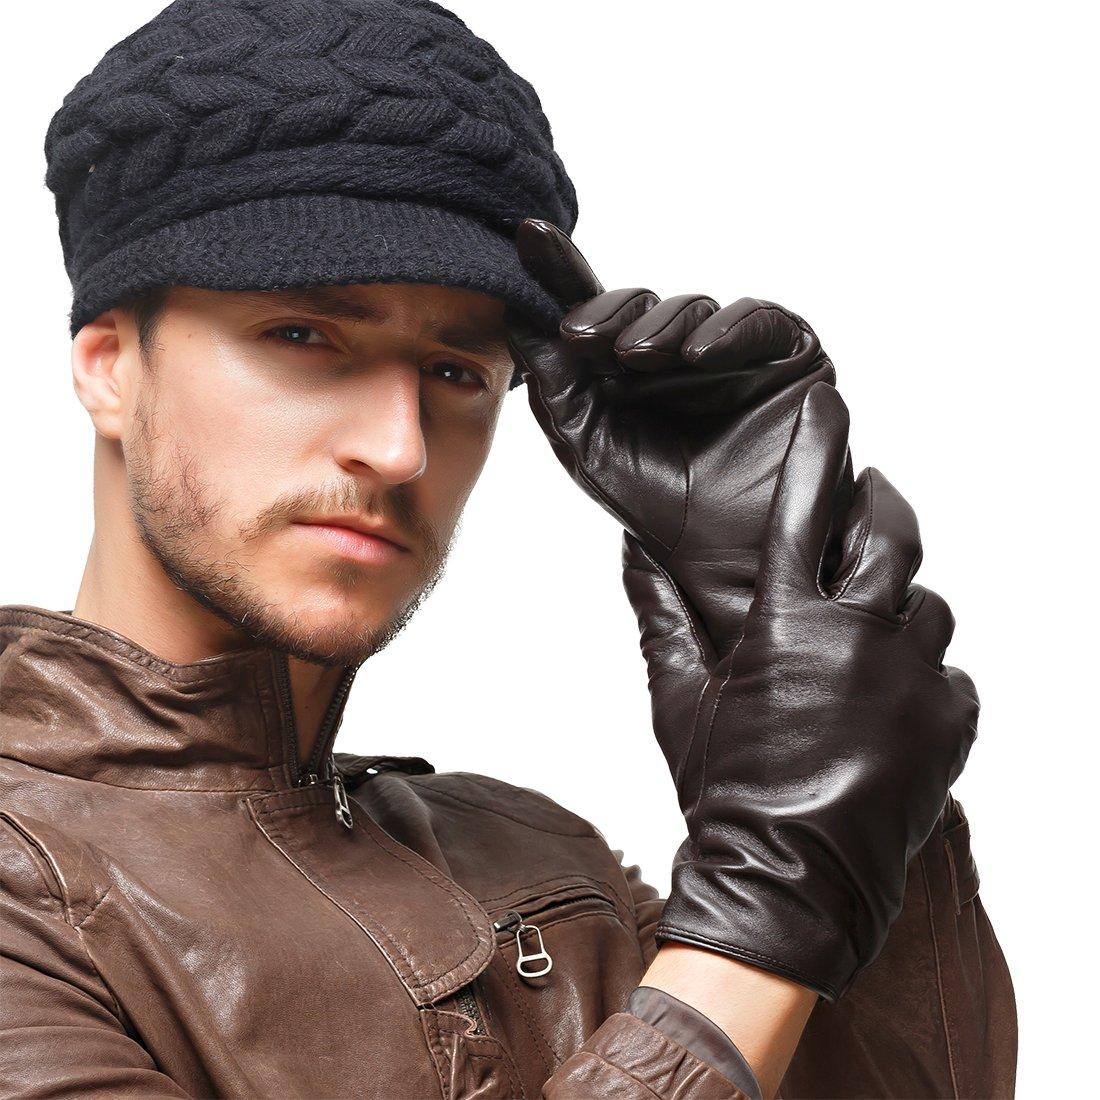 Nappaglo Herren klassische Lammfell Leder Handschuhe Touchscreen Reines Kaschmir-Futter Winter Warm Handschuhe B01LW5PN5Z Handschuhe & Fustlinge Jahresendverkauf